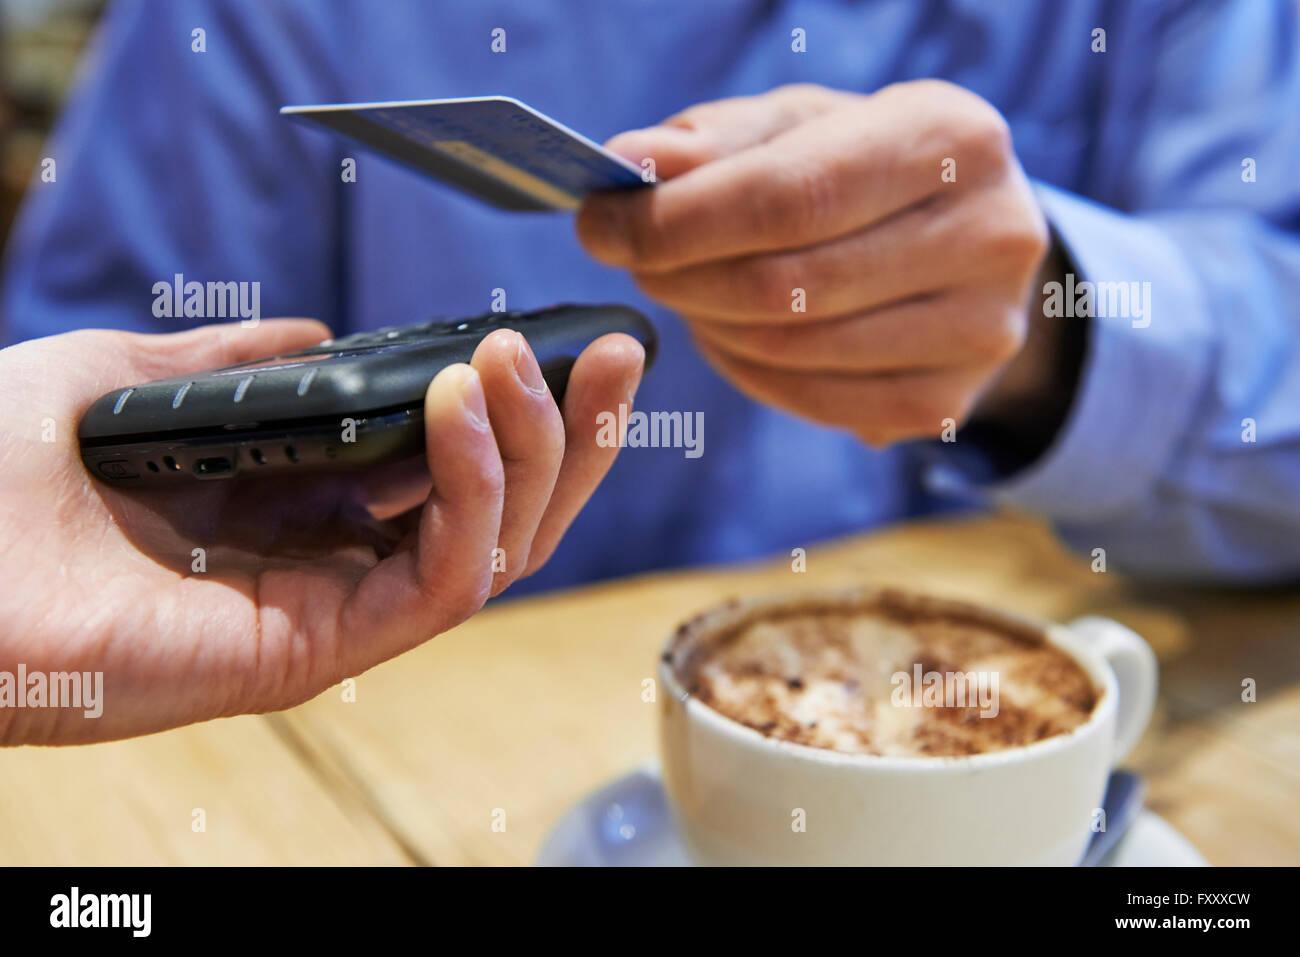 Kunden mit kontaktloses Bezahlen In Coffee-Shop Stockbild